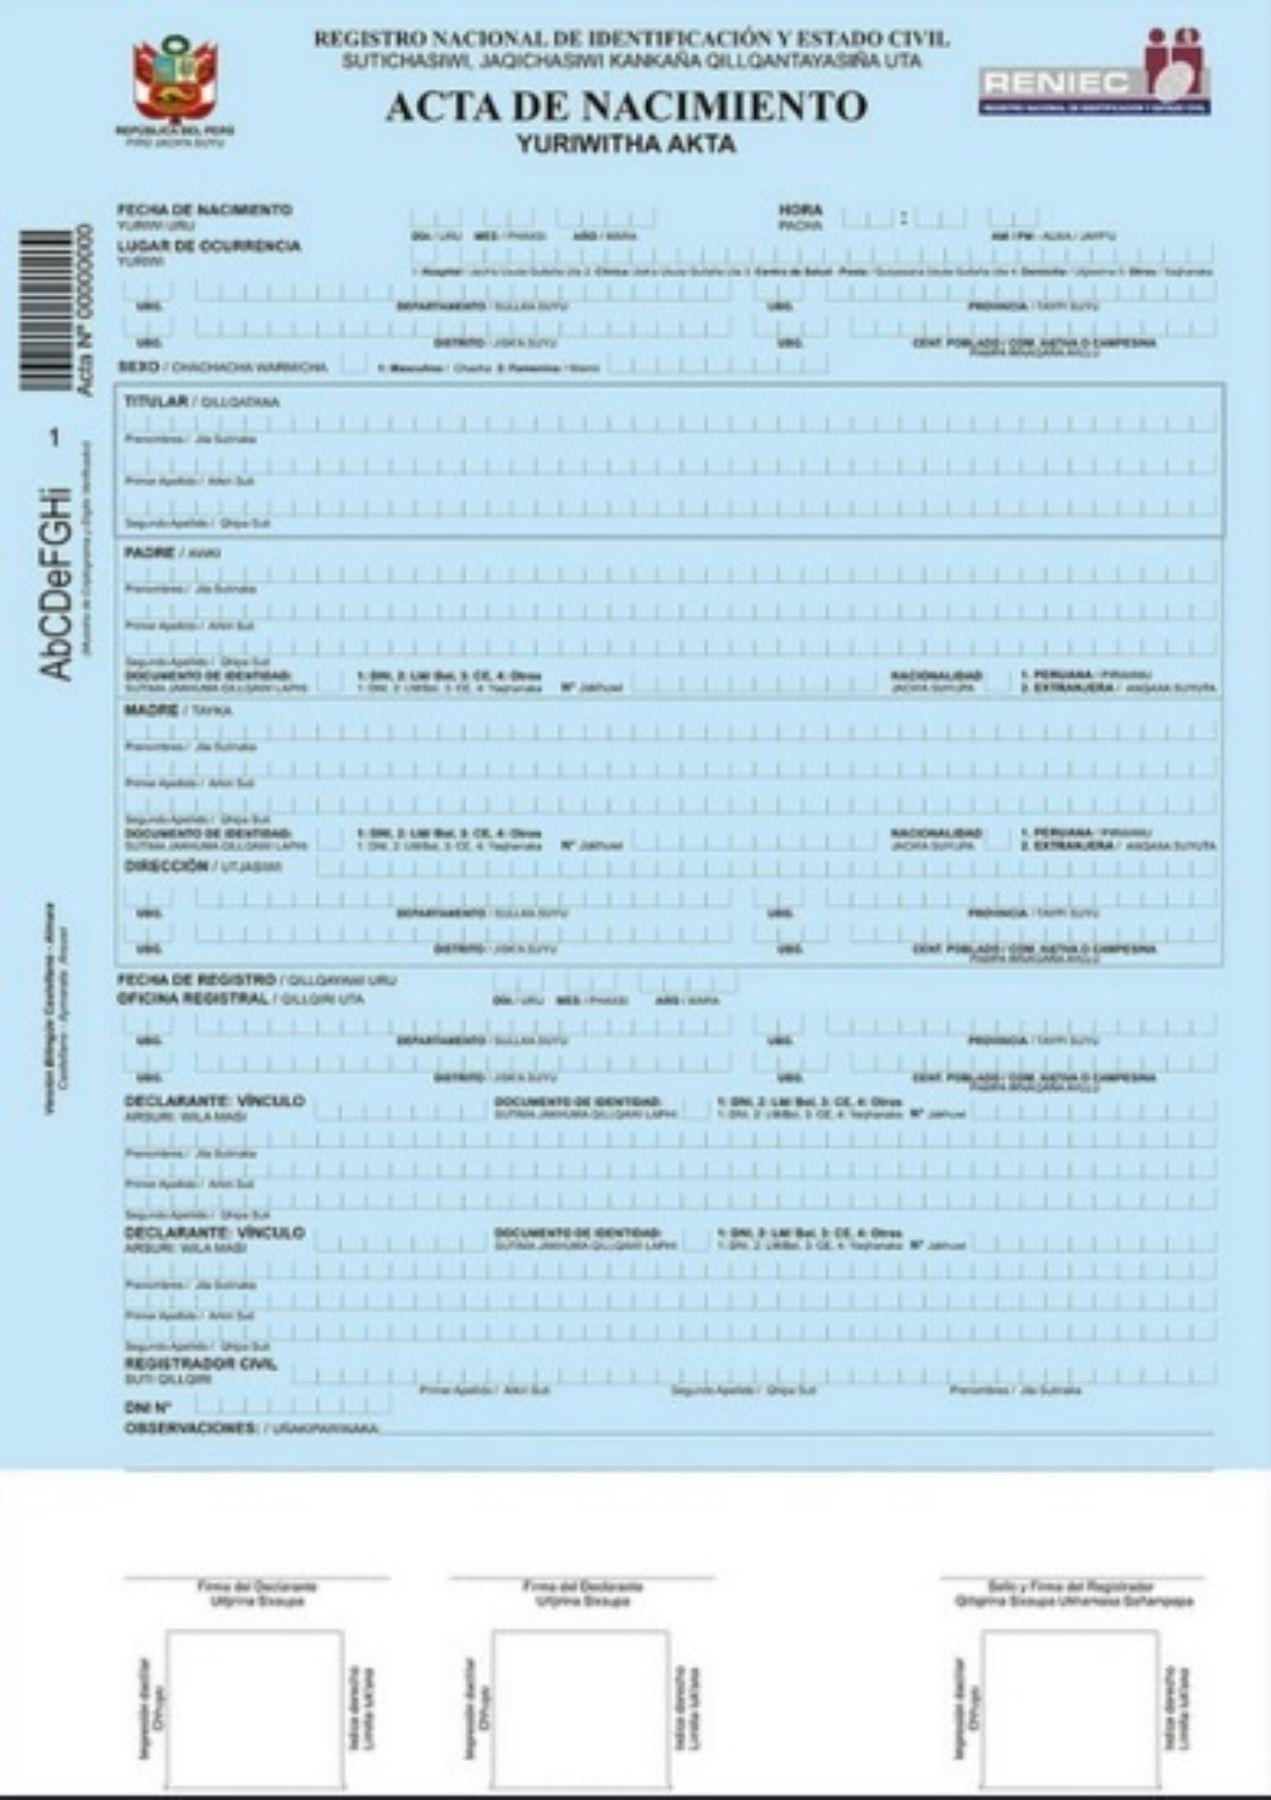 Registro Civil Bilingüe se extiende para pobladores wampi de ...